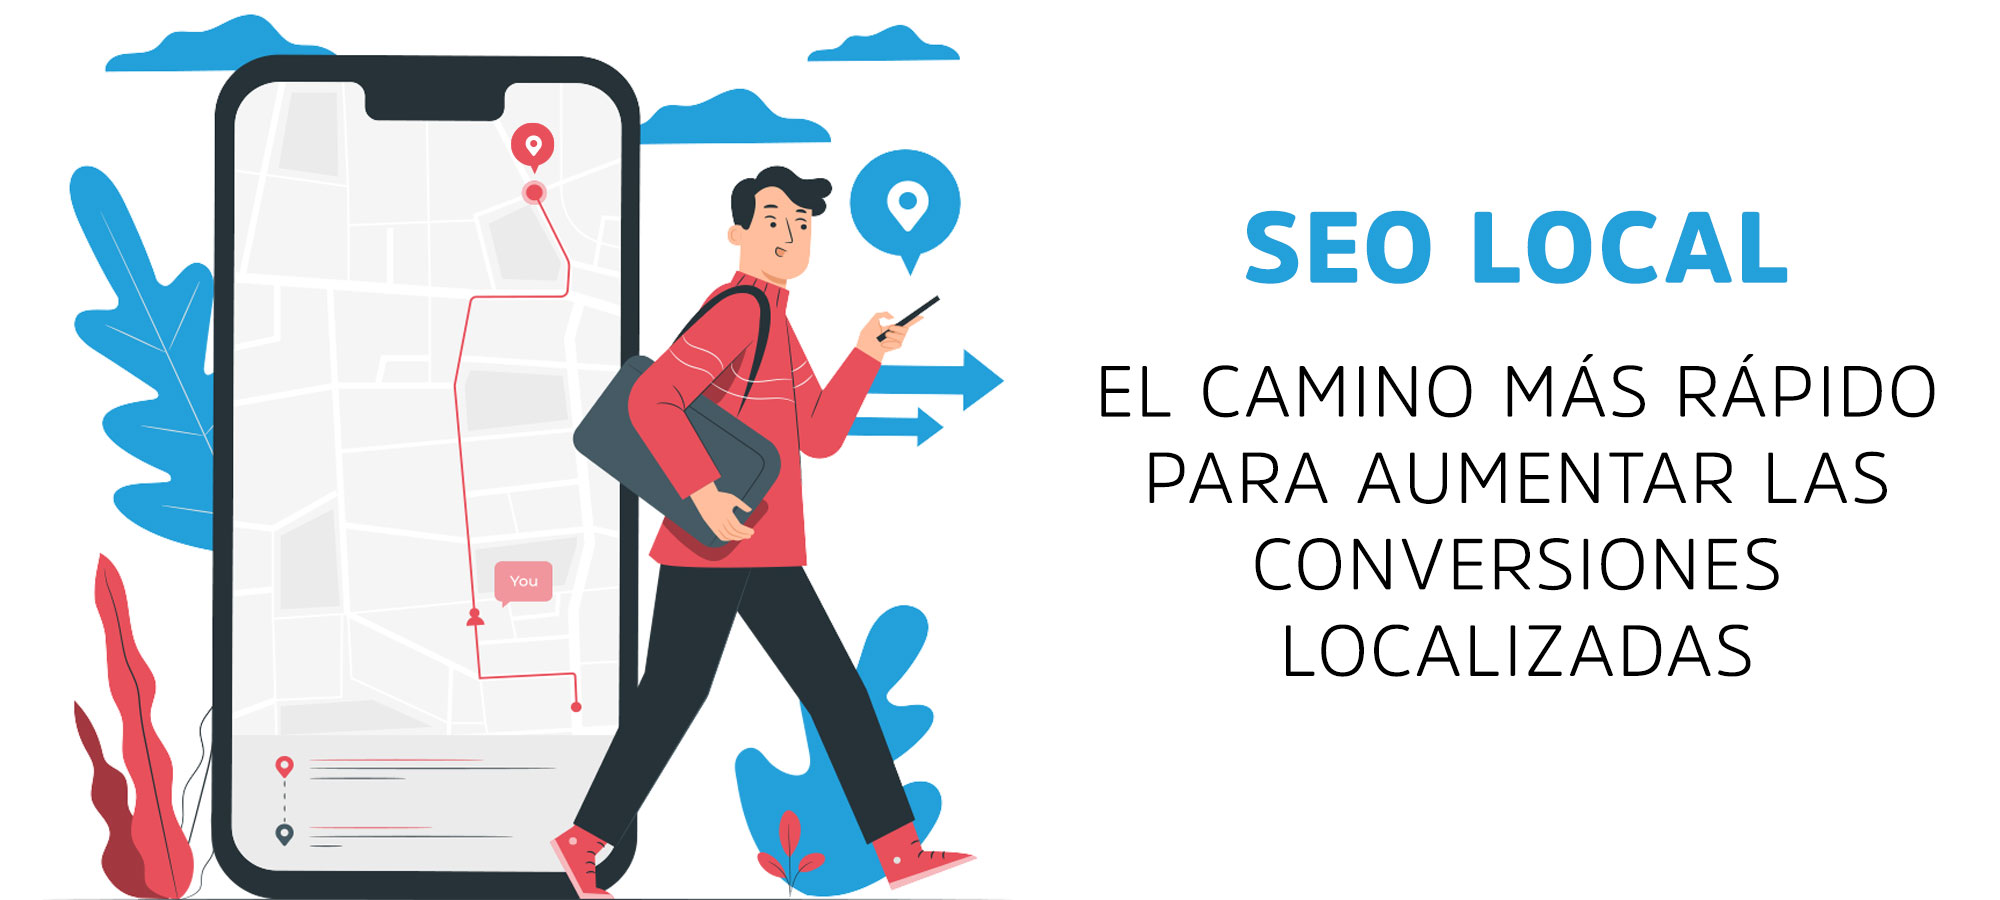 SEO Local: Google My Business